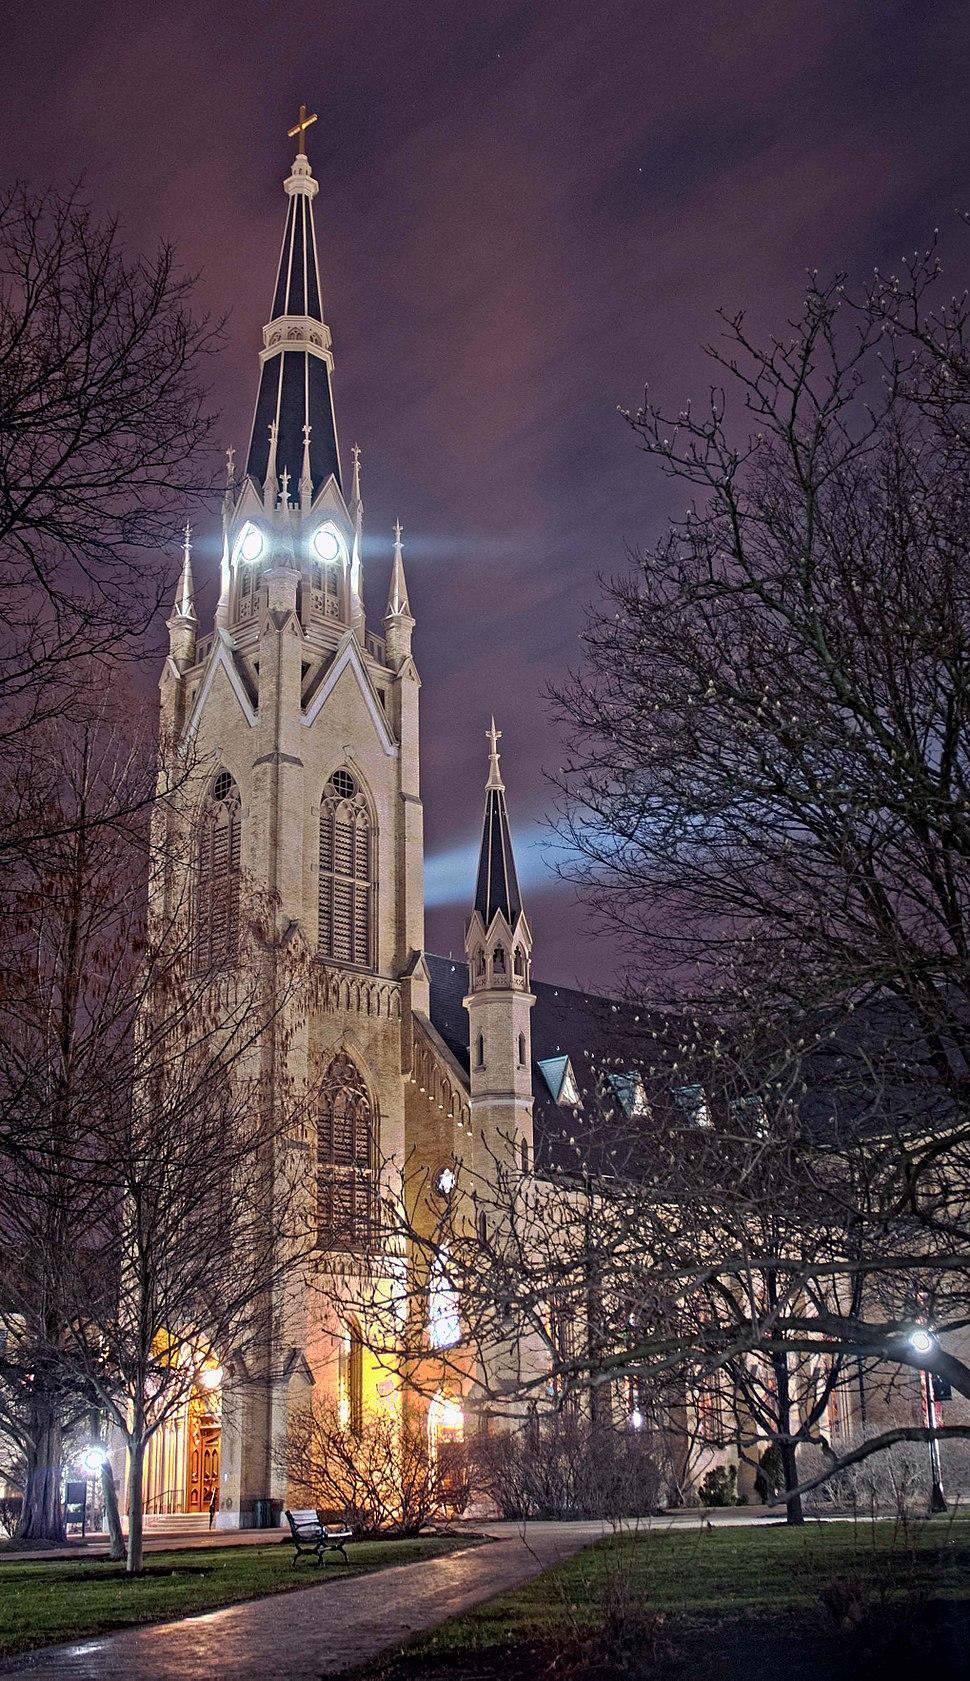 Basilica of the Sacred Heart at Night